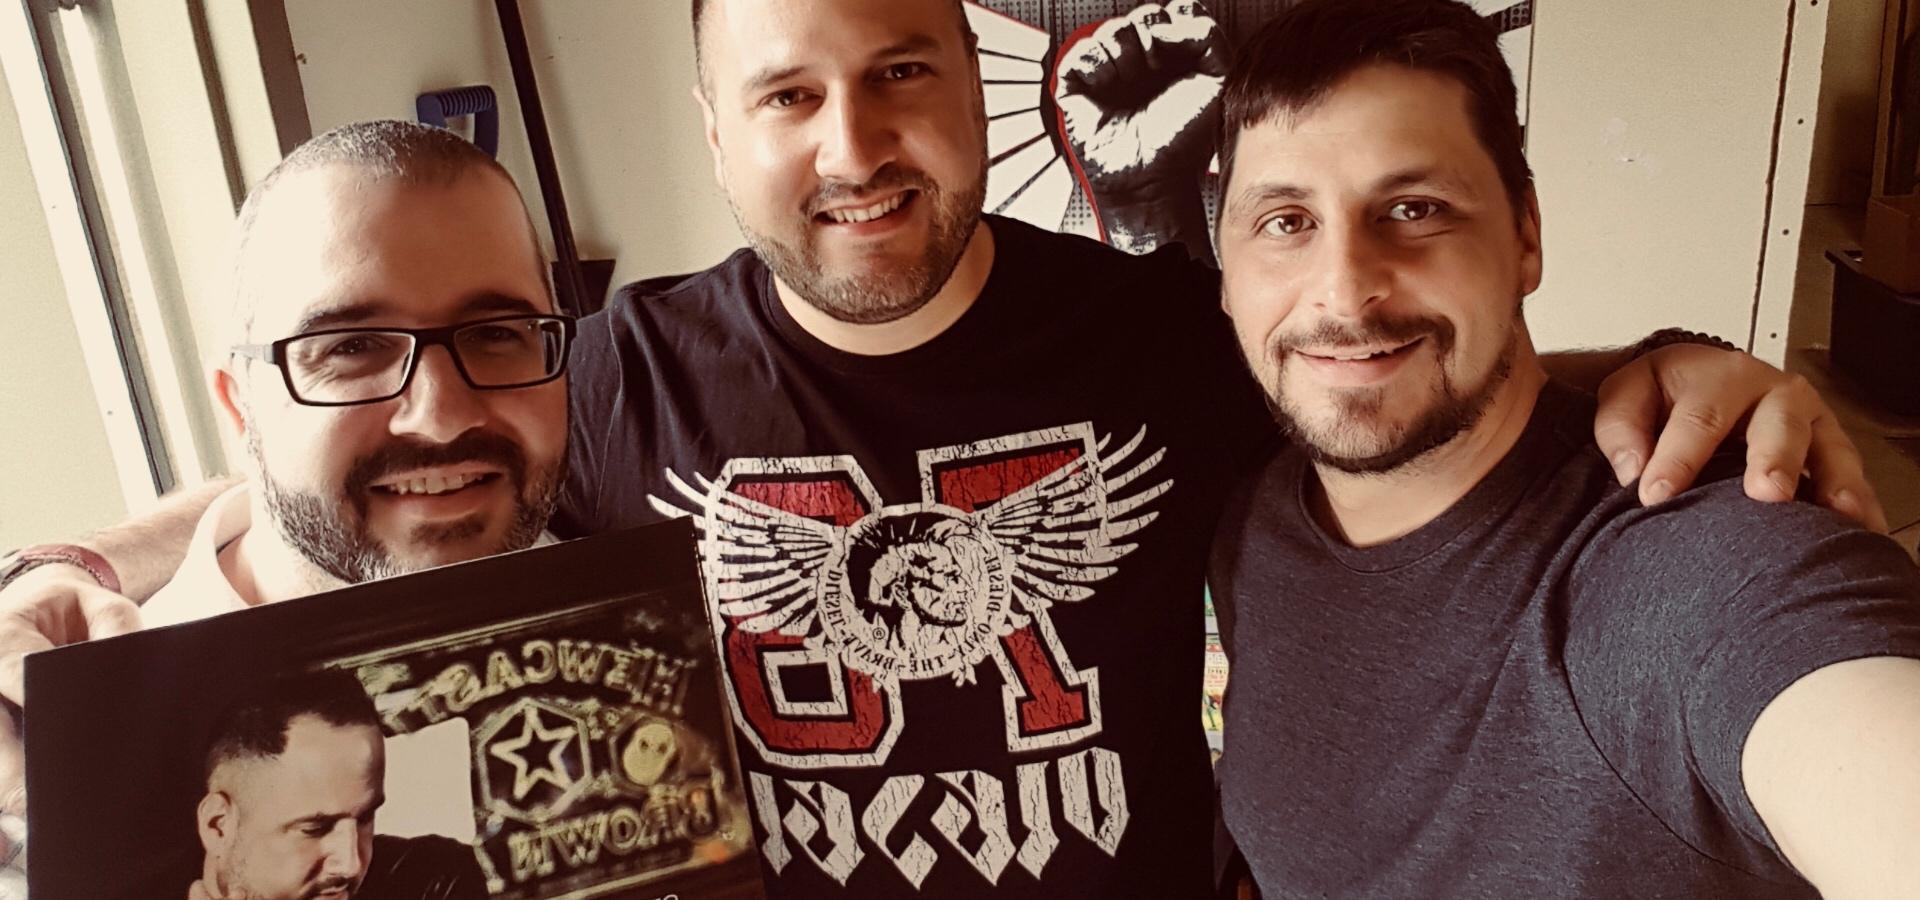 Steph Morin new EP release countdown Propagande Distributions